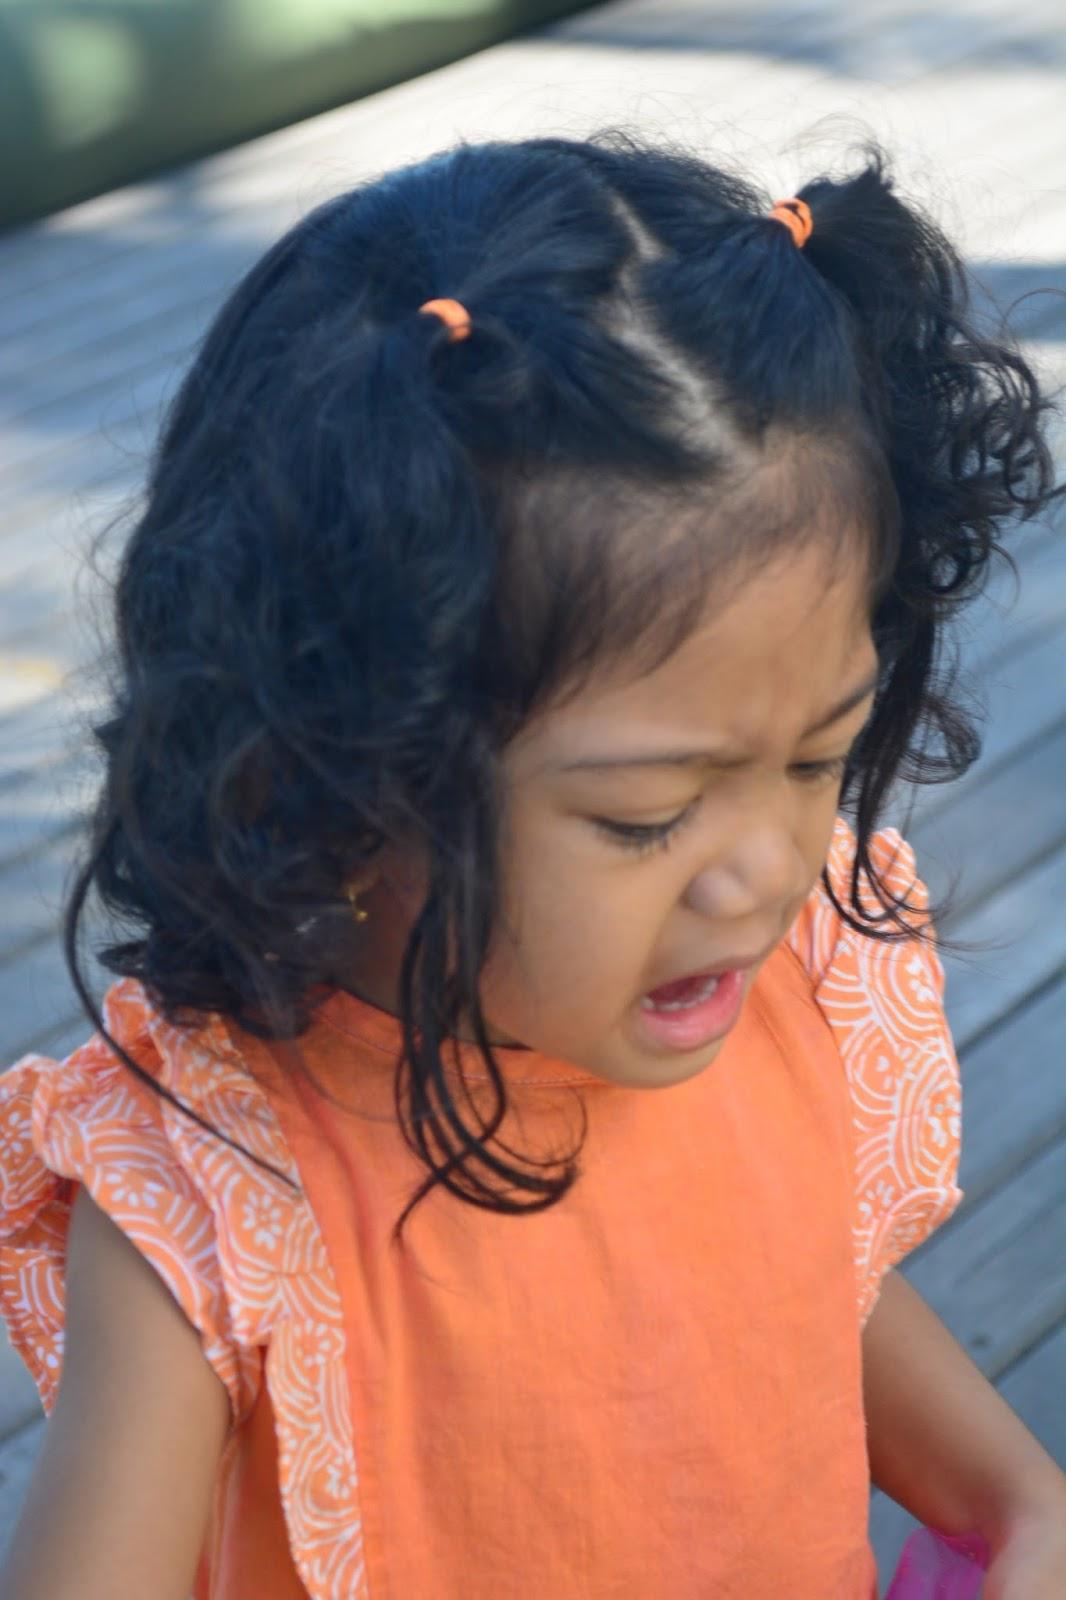 Lisna Dwi Ardhini Cara Jitu Menyiapkan Pendidikan Anak Di Era